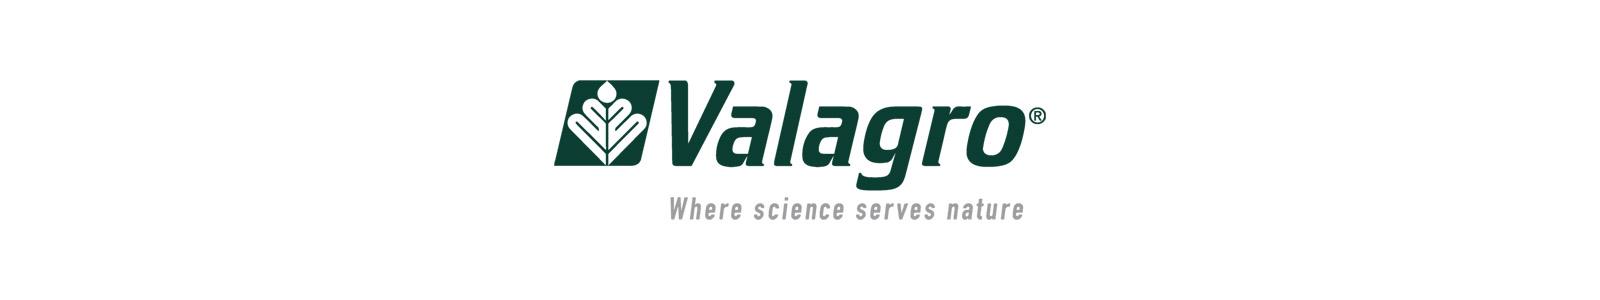 Valagro - Case Study